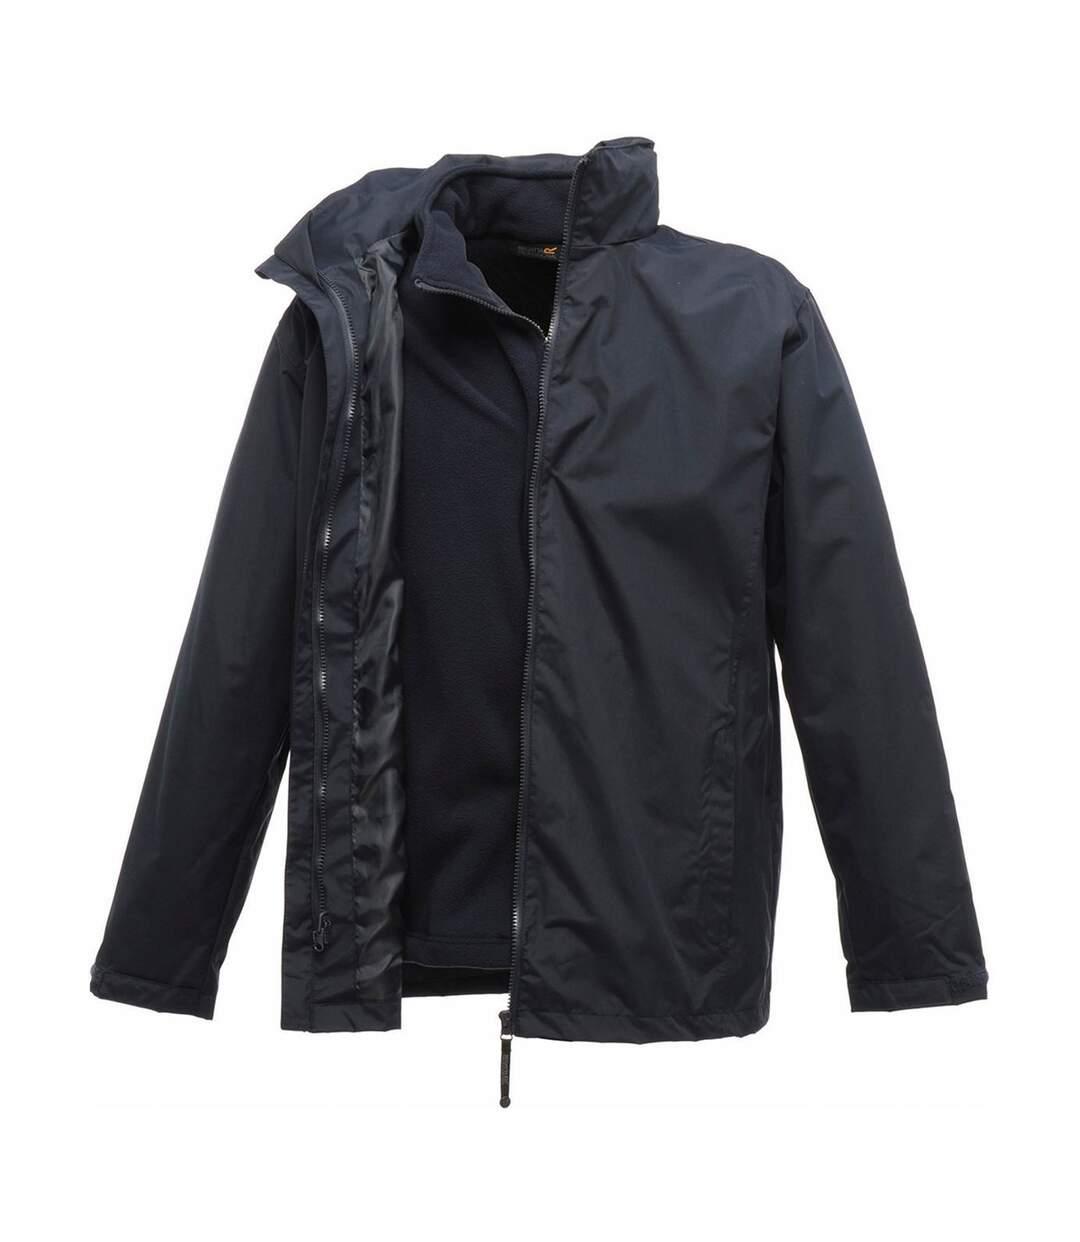 Parka veste imperméable 3 en 1 homme TRA150 - bleu marine